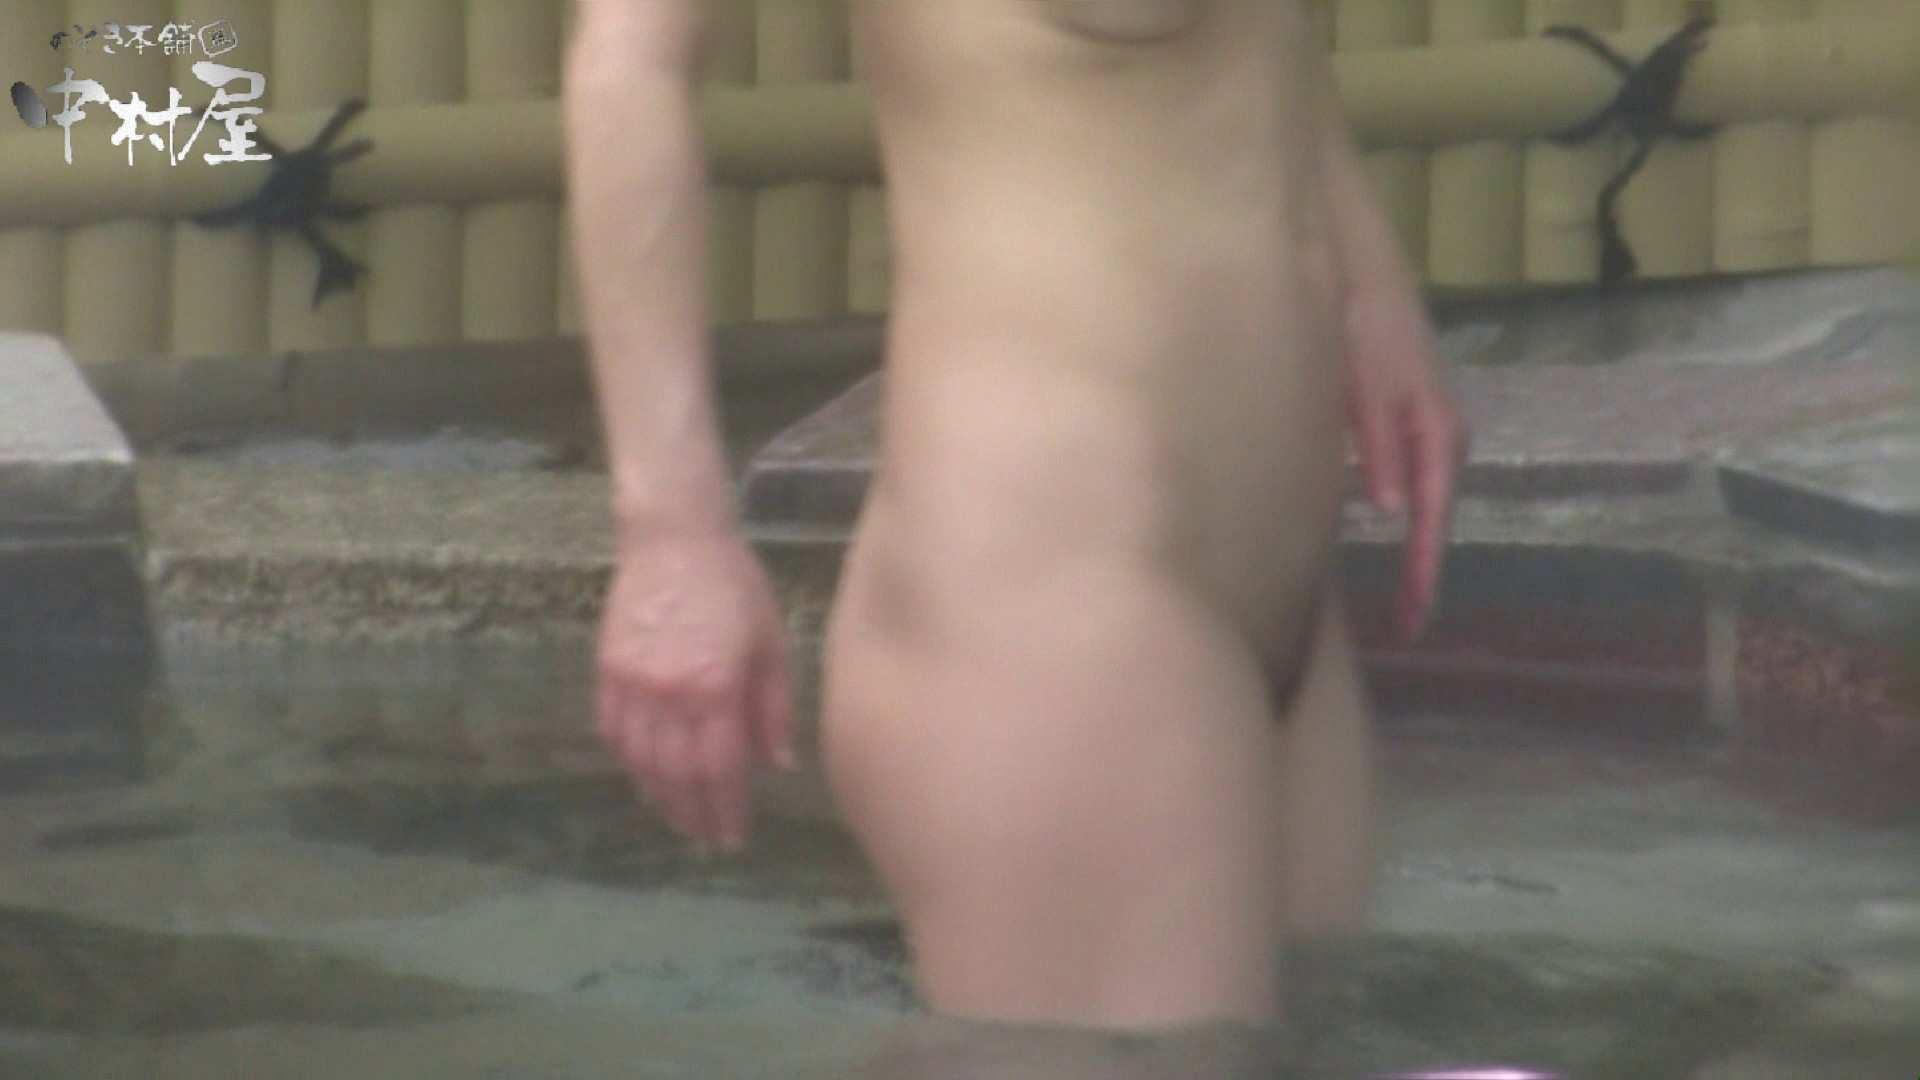 Aquaな露天風呂Vol.927 OLのプライベート  12pic 12